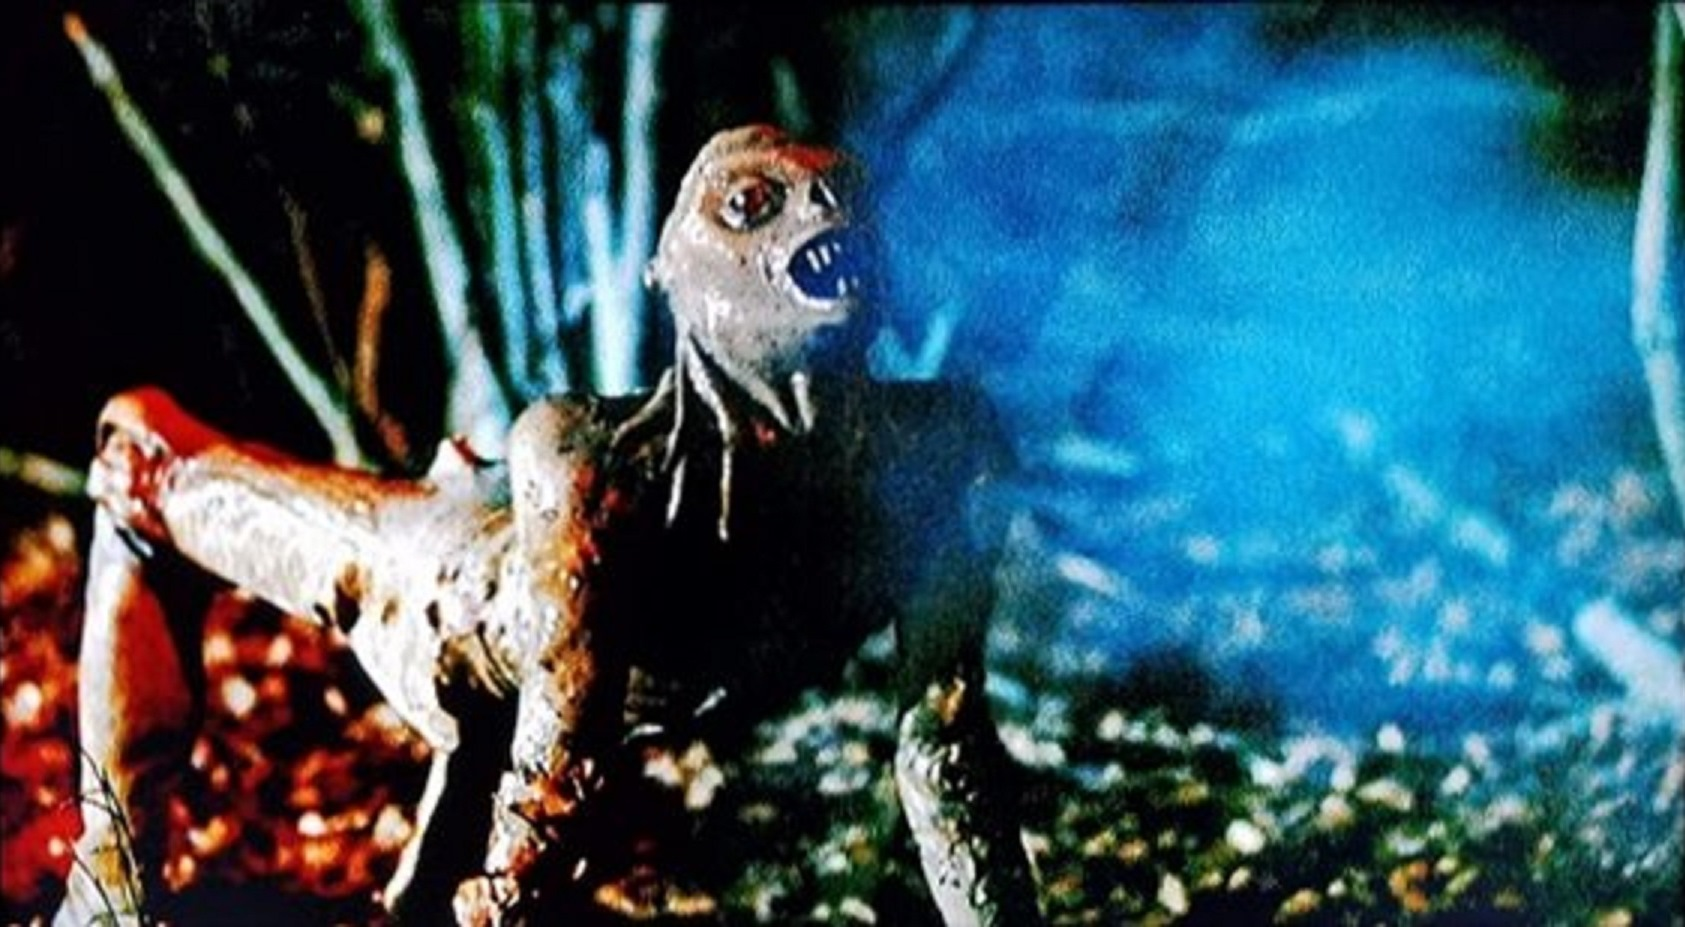 The alien creature in Xtro (1982)